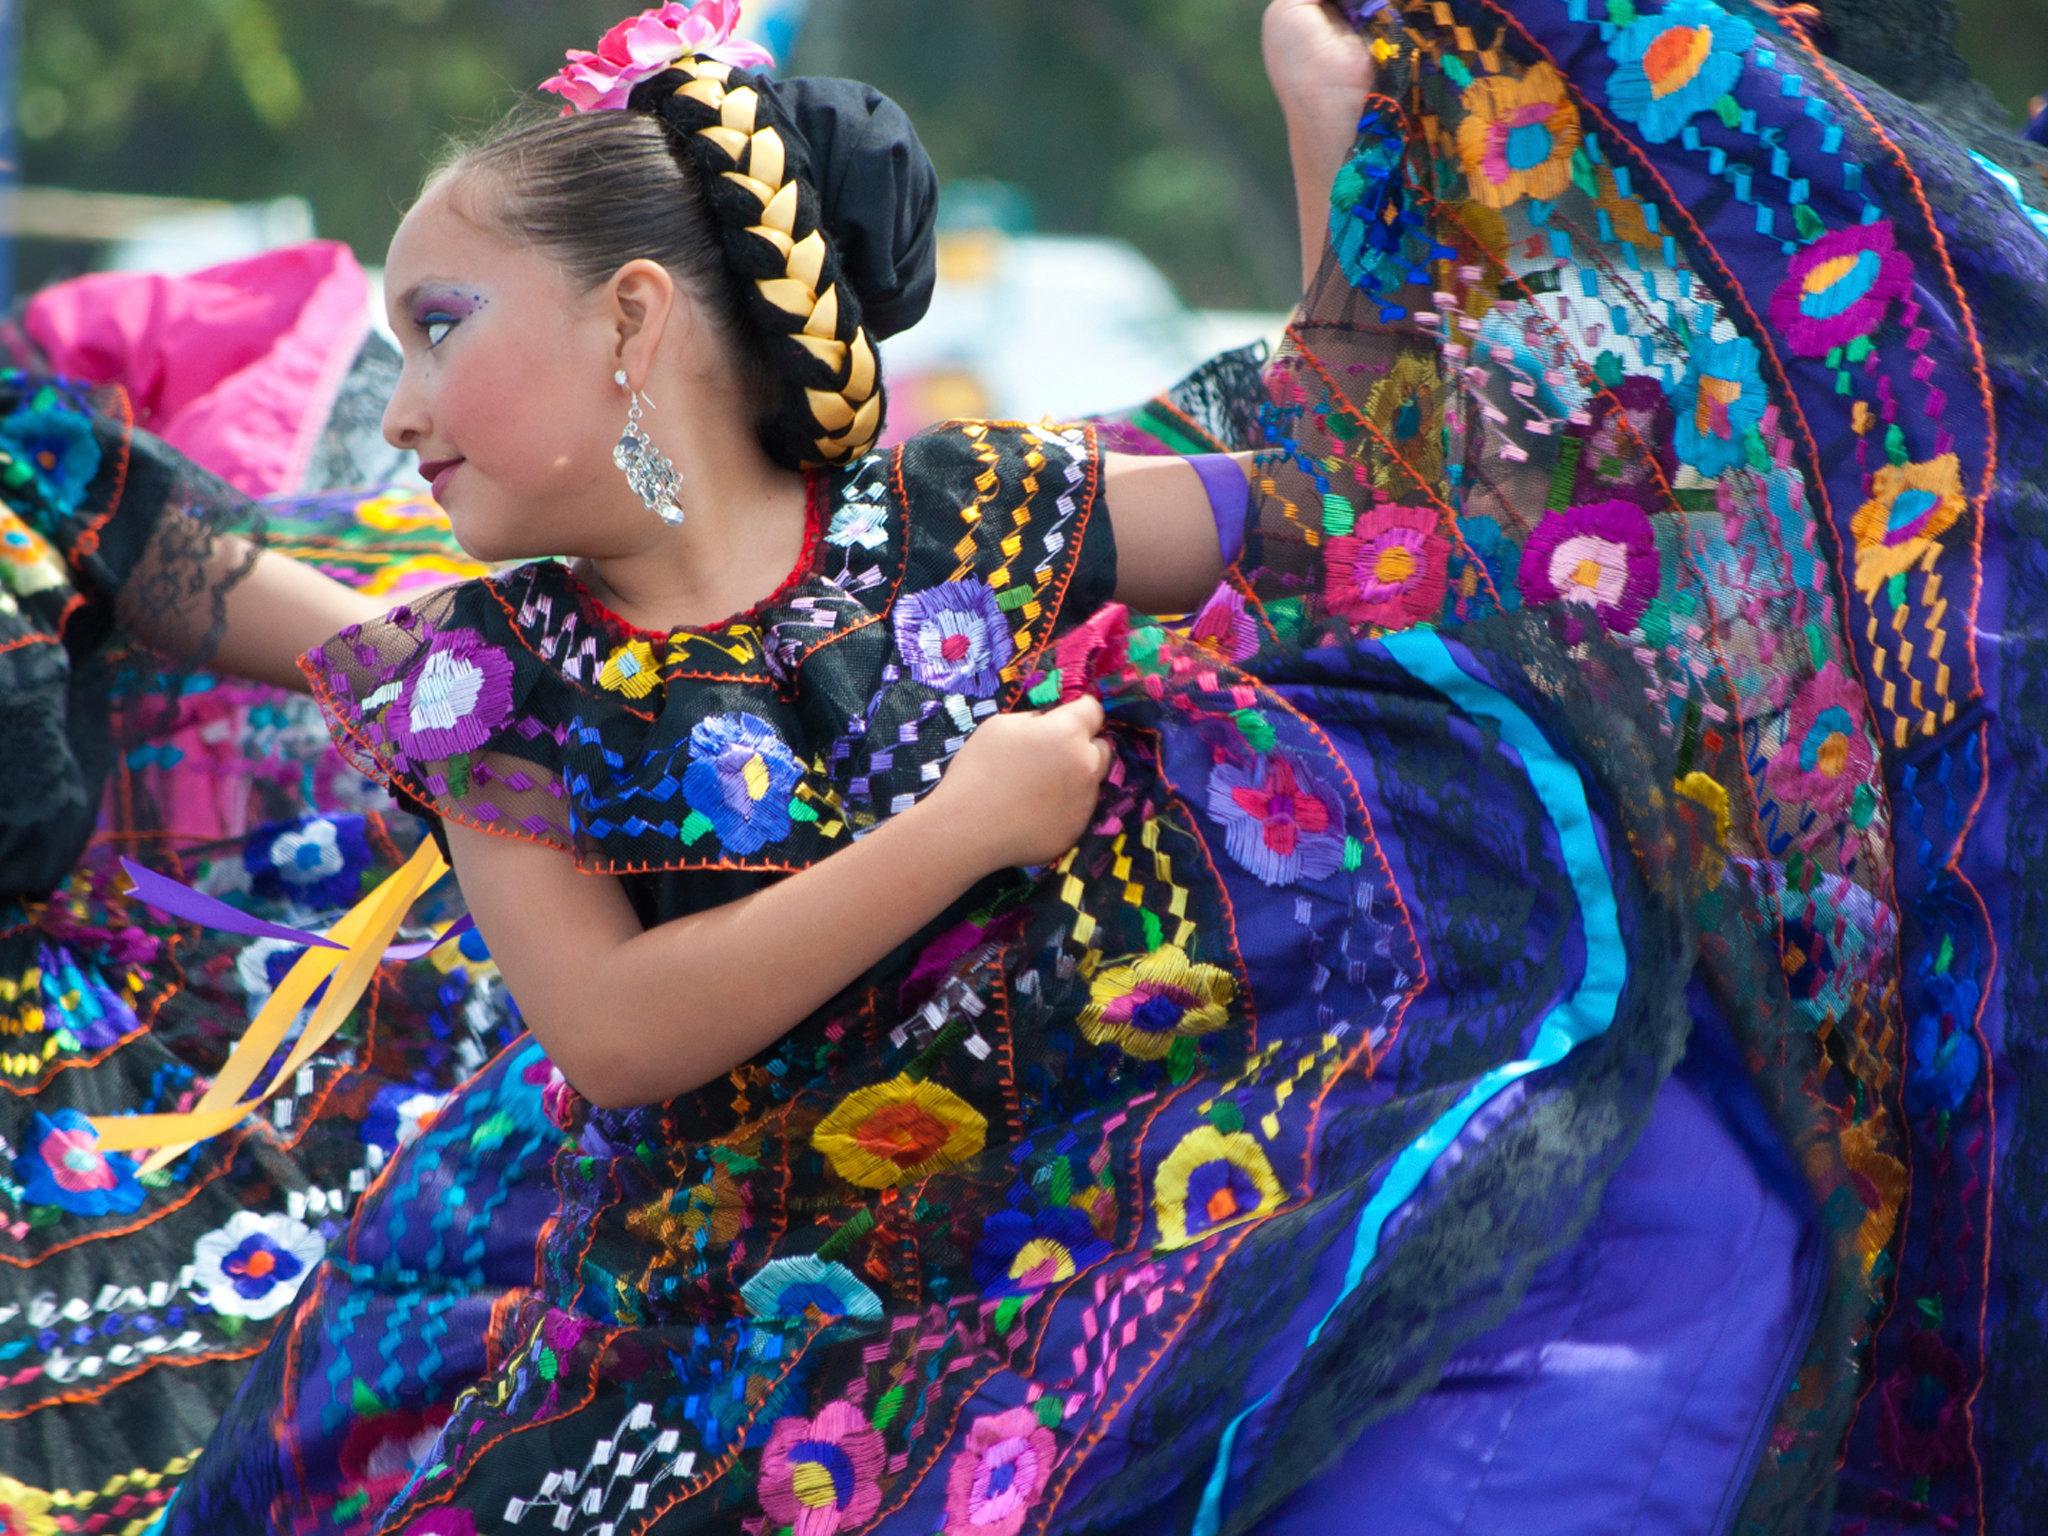 Danza folclórica para niños: Cristina Ramírez